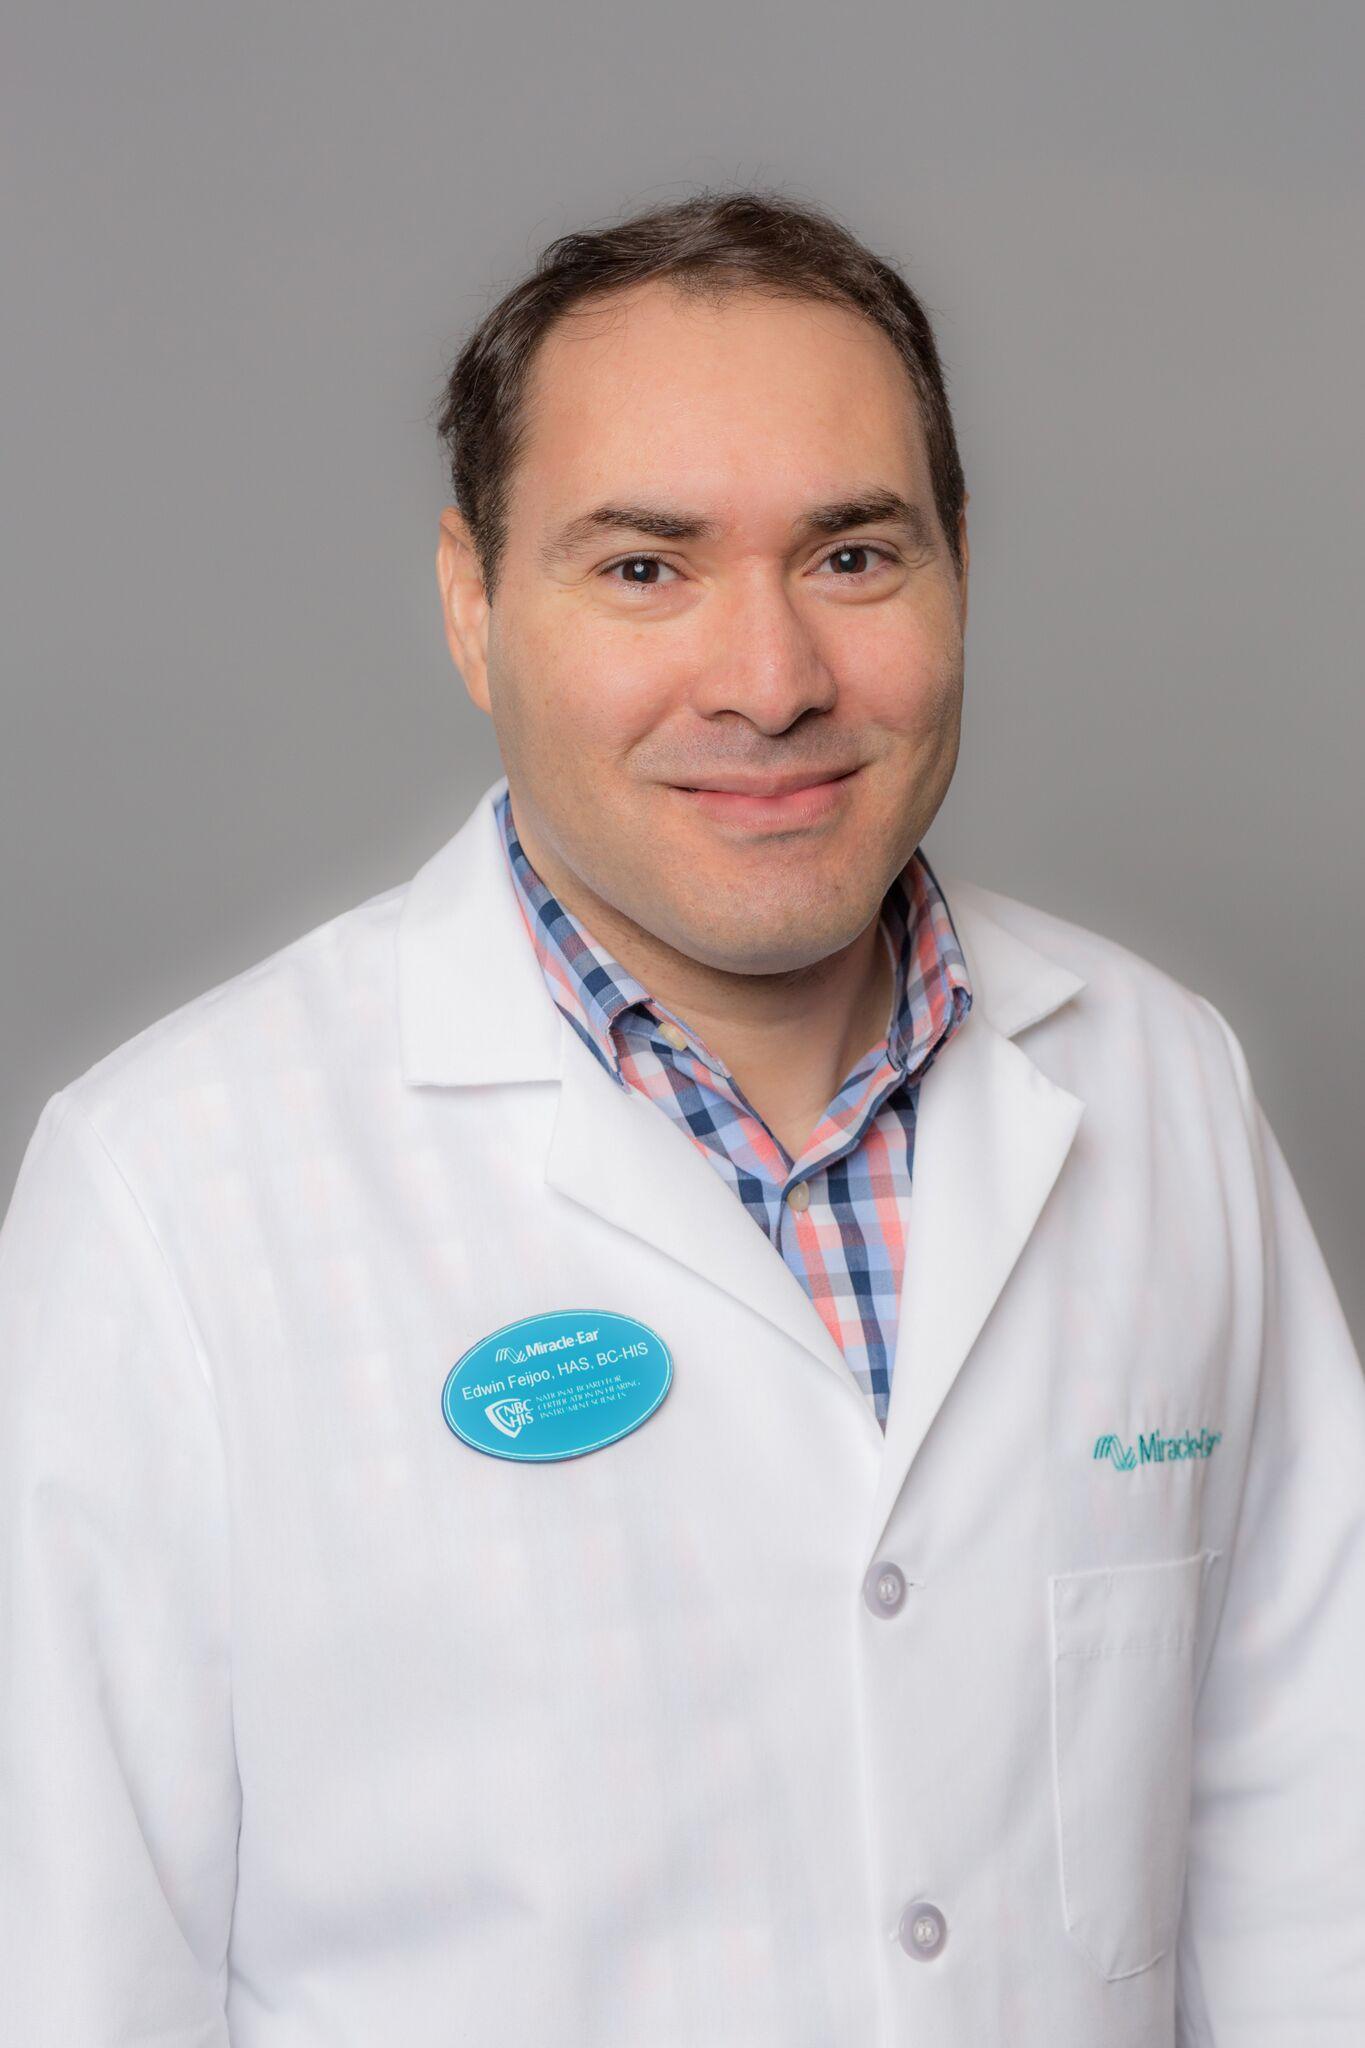 Profile Photo of Edwin - Board Certified in Hearing Instrument Sciences